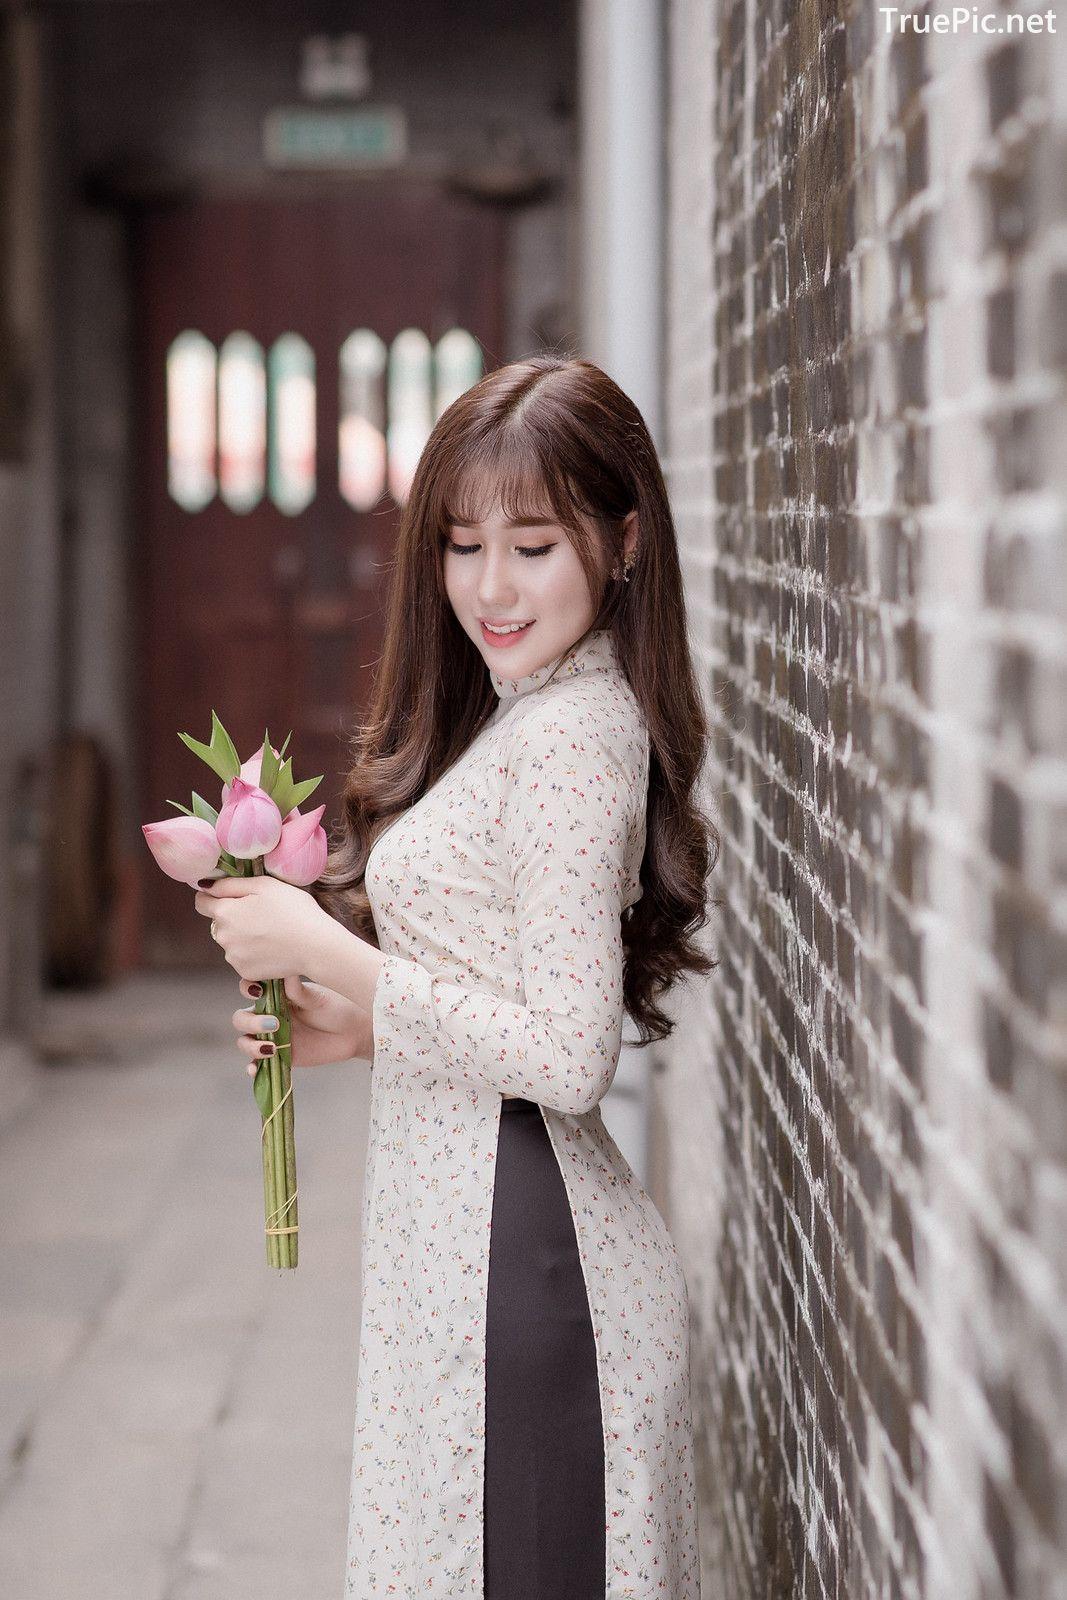 Image-Vietnamese-Beautiful-Girl-Ao-Dai-Vietnam-Traditional-Dress-by-VIN-Photo-2-TruePic.net- Picture-7